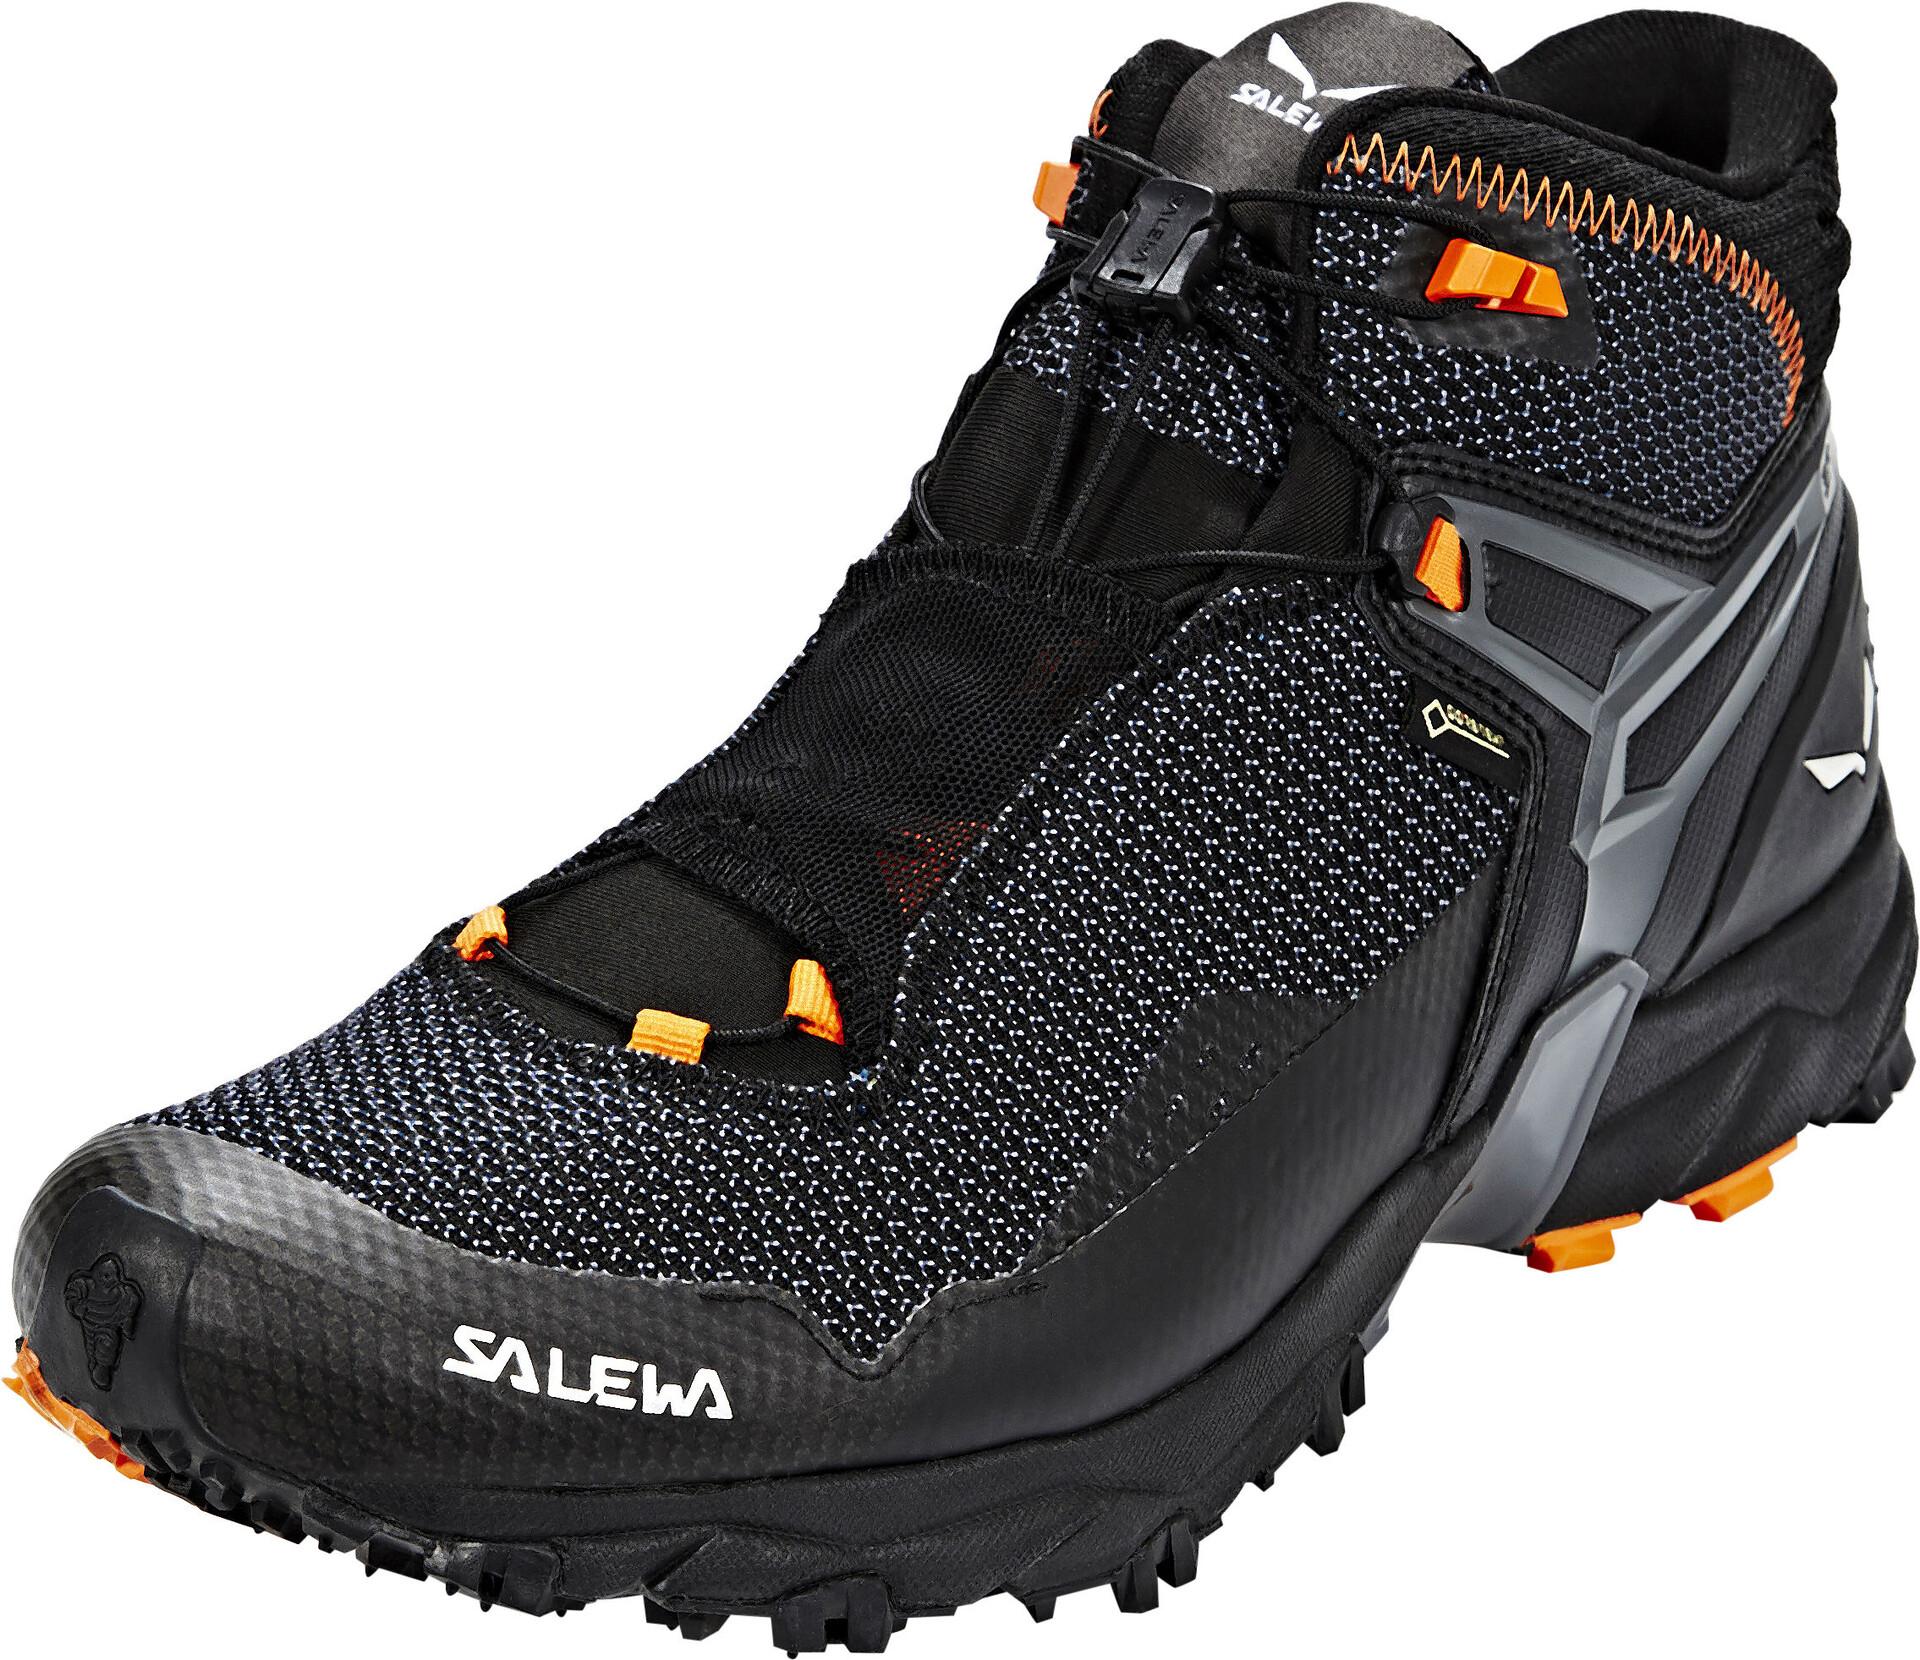 SALEWA Ultra Flex Mid GTX Scarpe da trekking Uomo, blackholland